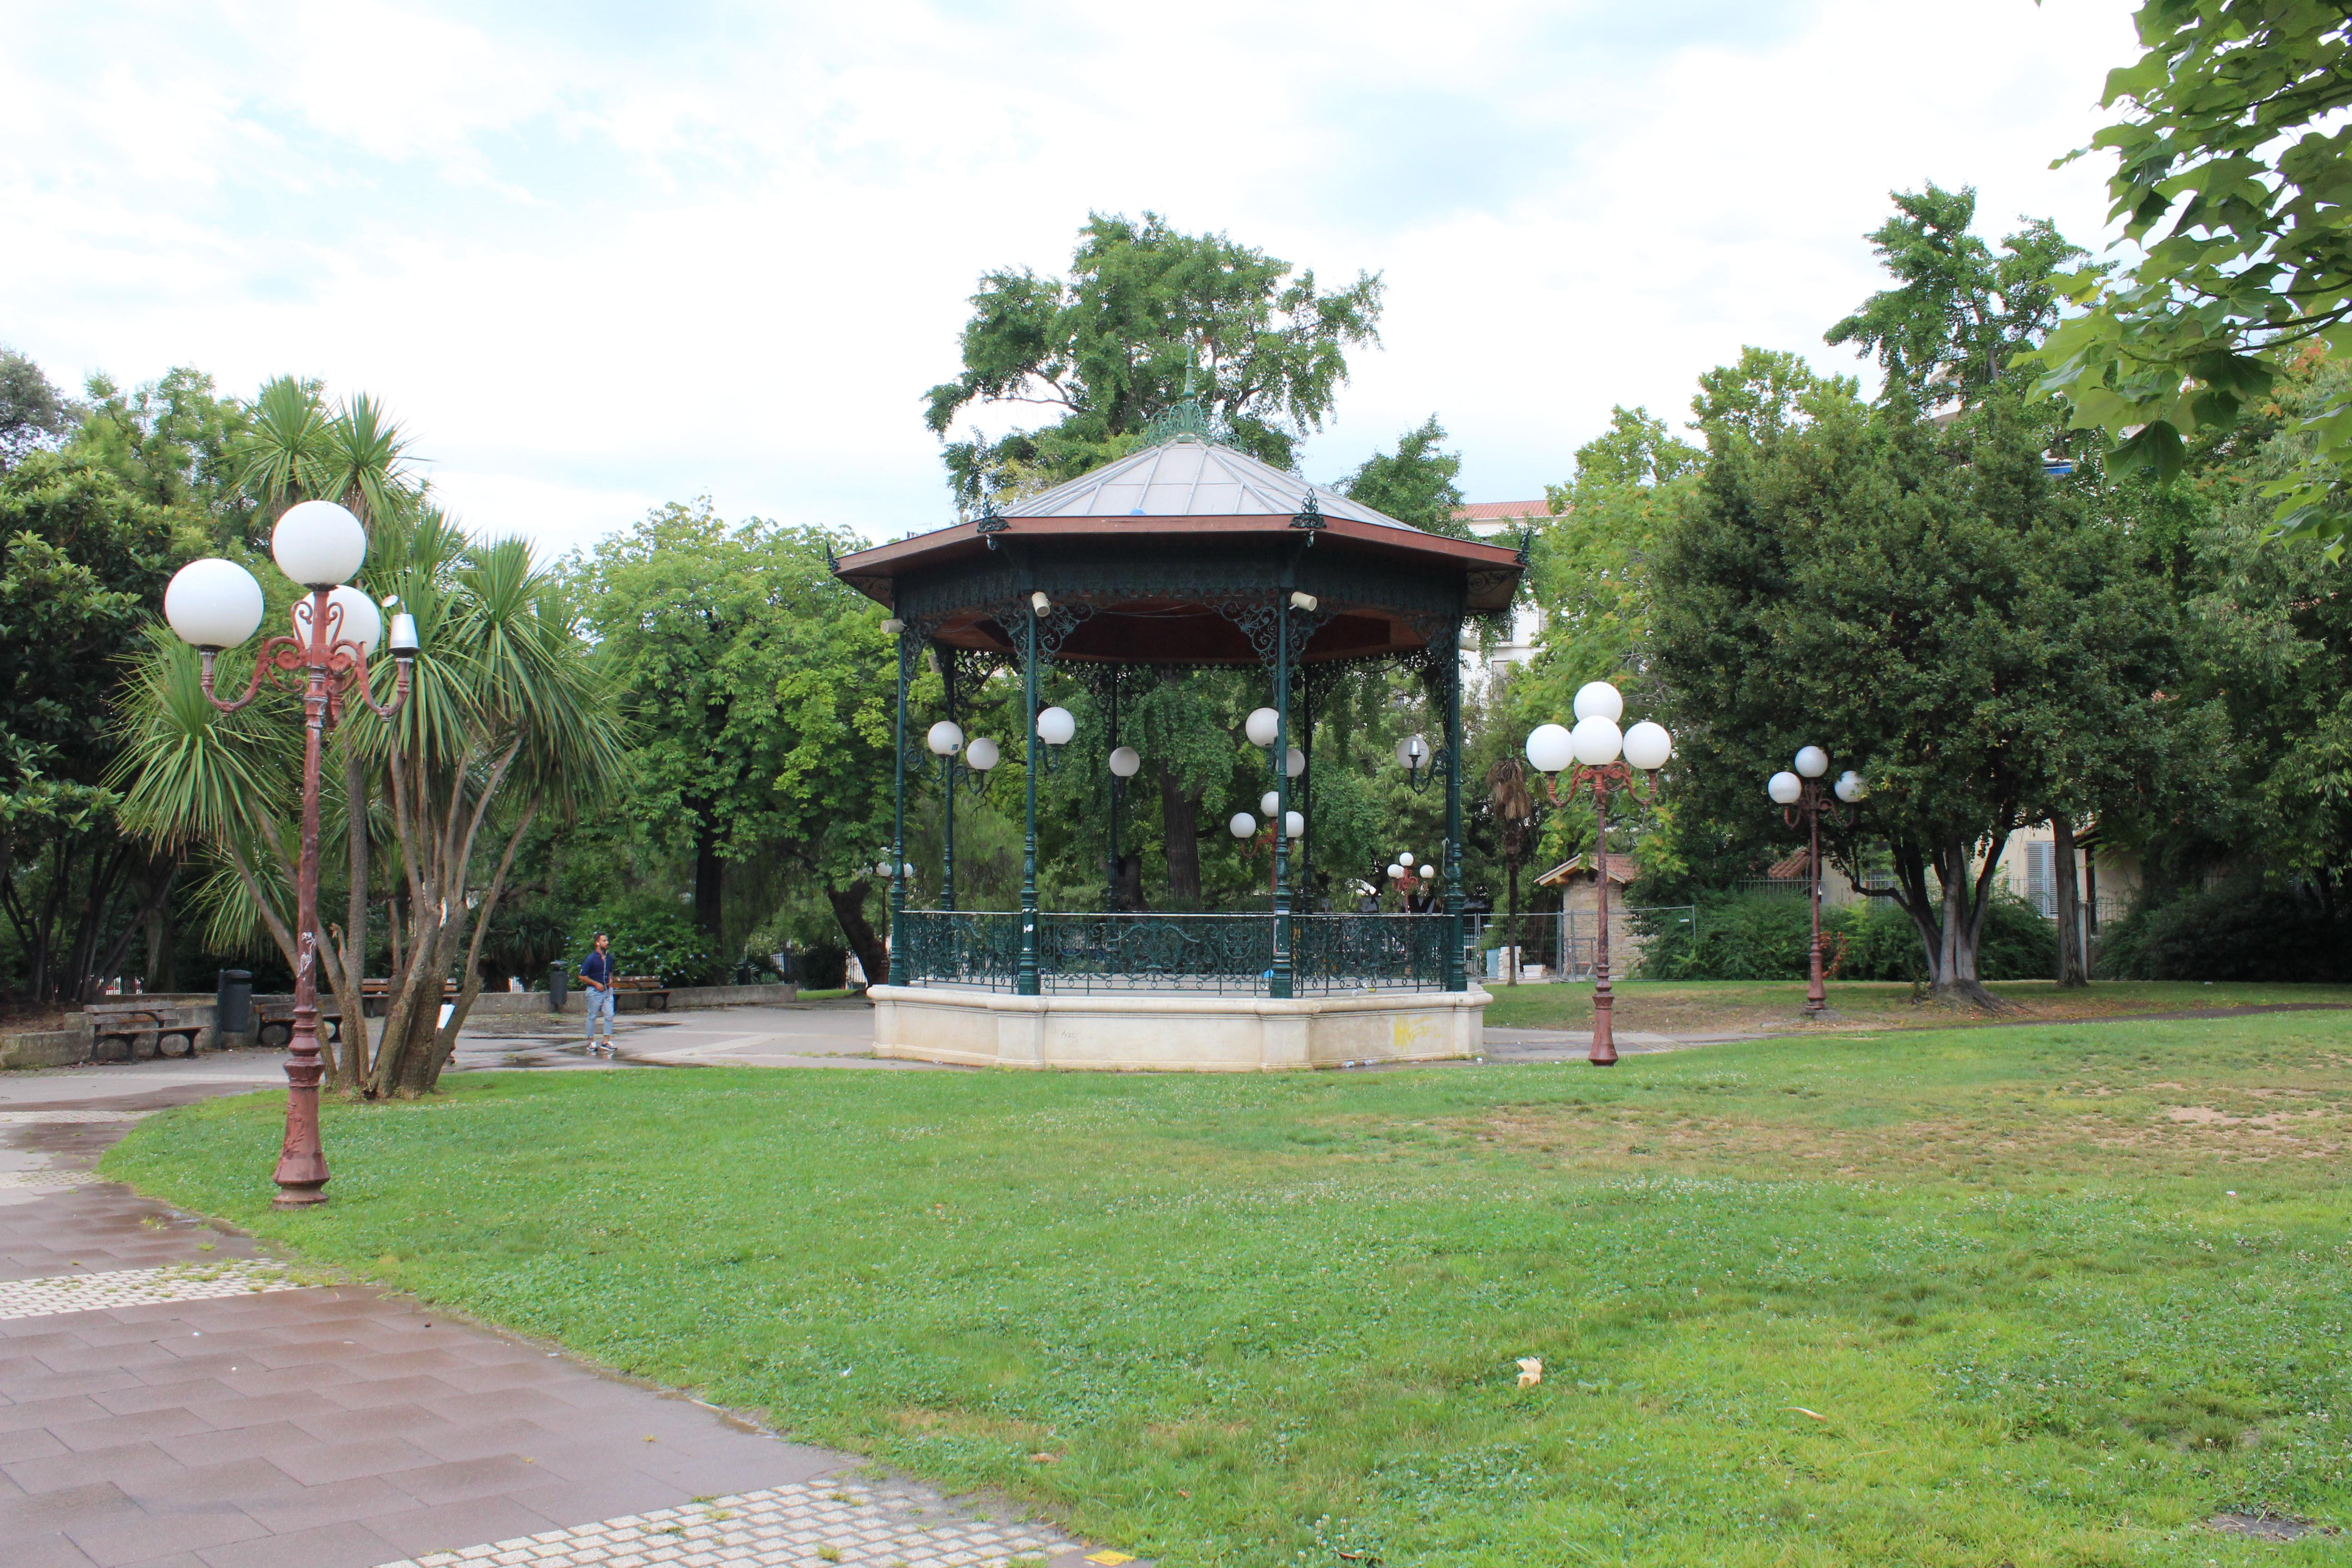 File Kiosque Jardin Alexandre Ier Toulon 3 Jpg Wikimedia Commons